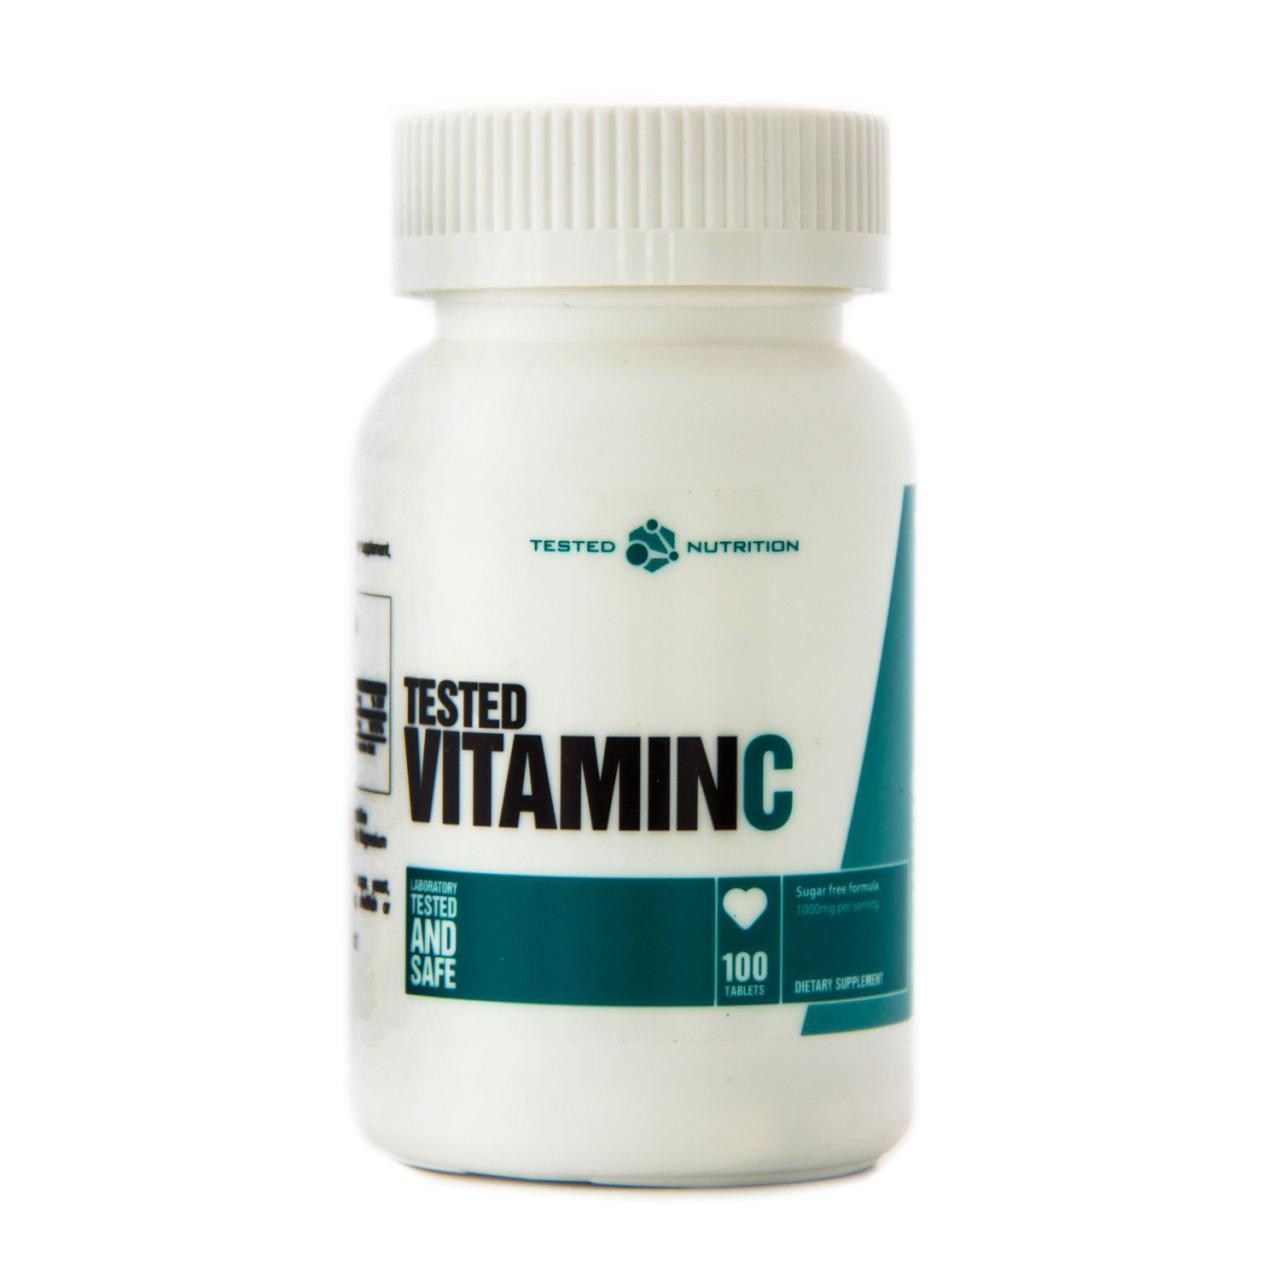 Tested Vitamin C (100 Tabletten)